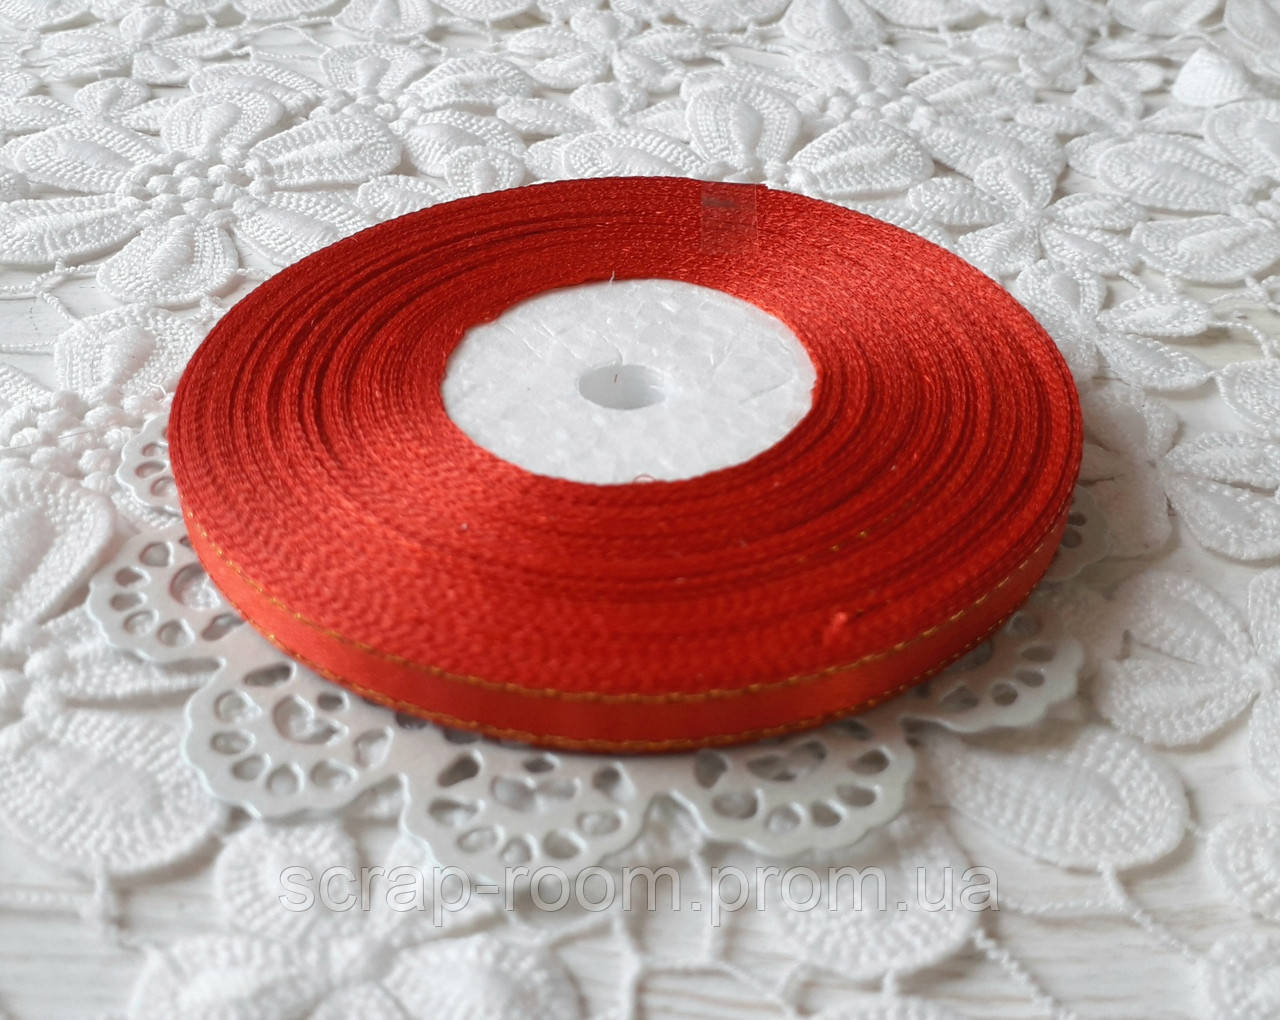 Лента атласная 0,6 см красная с люрексом золото, лента с люрексом, лента атласная красная люрекс, цена за метр